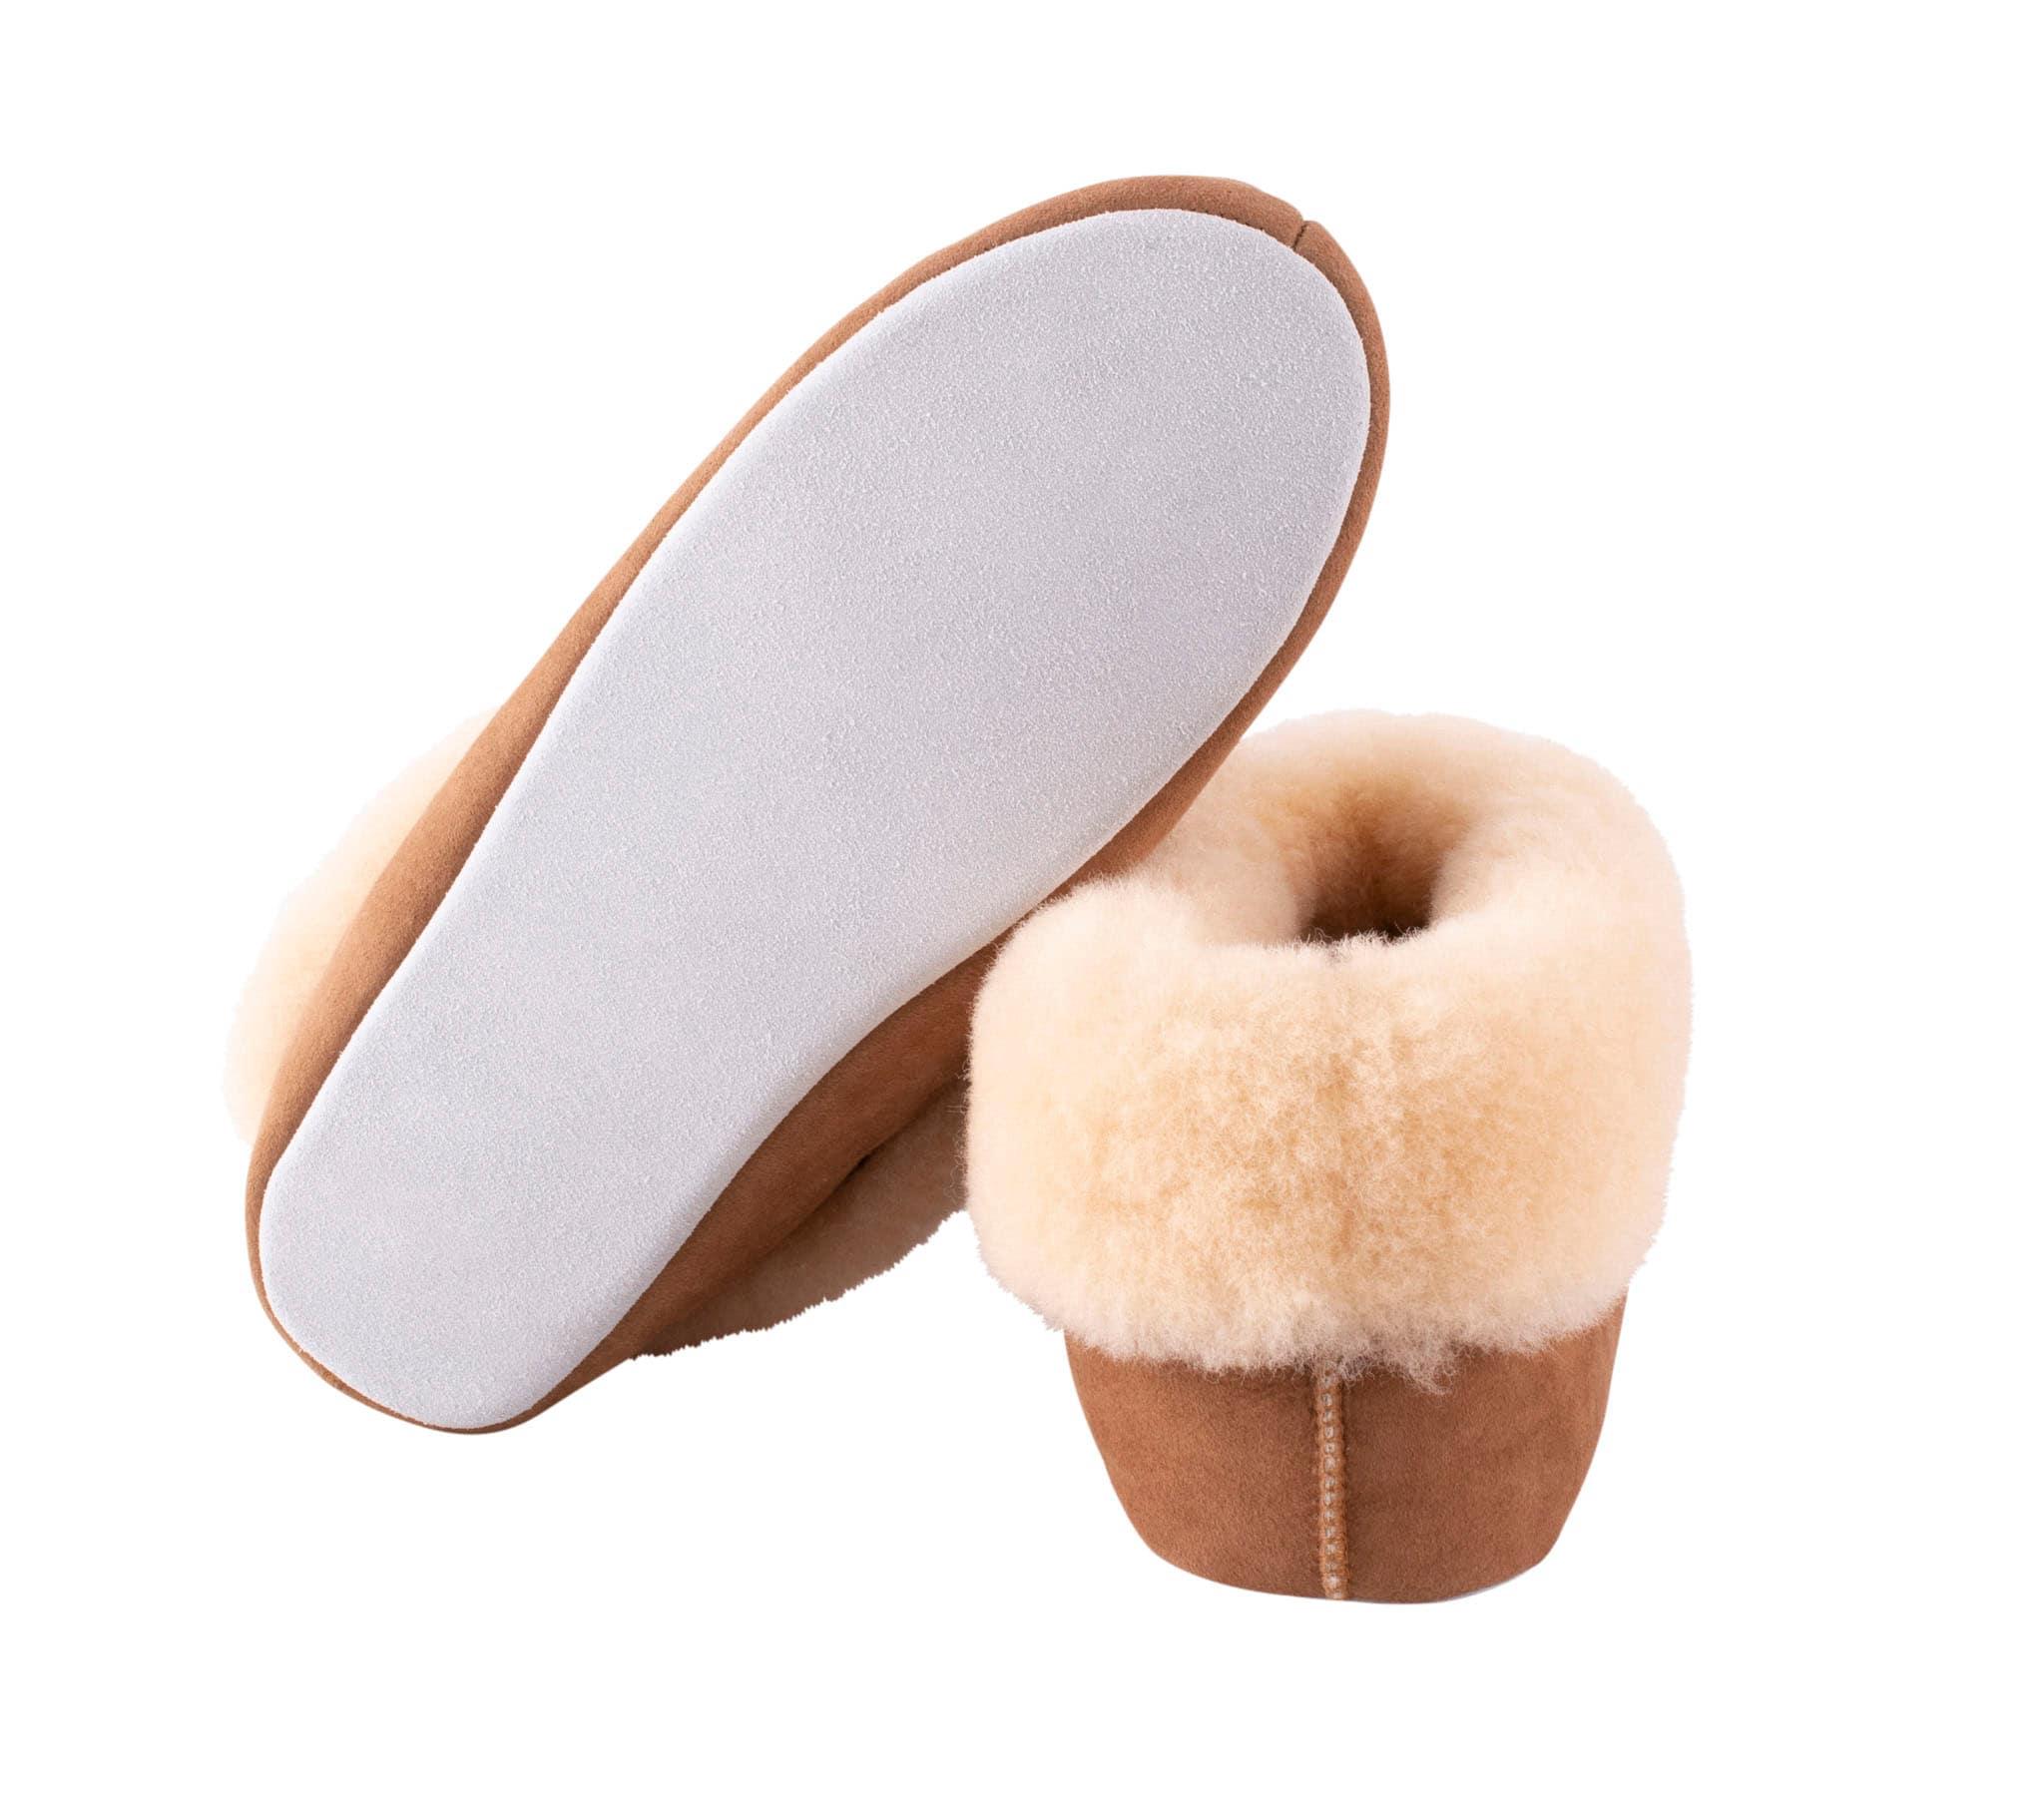 Moa sheepskin slippers